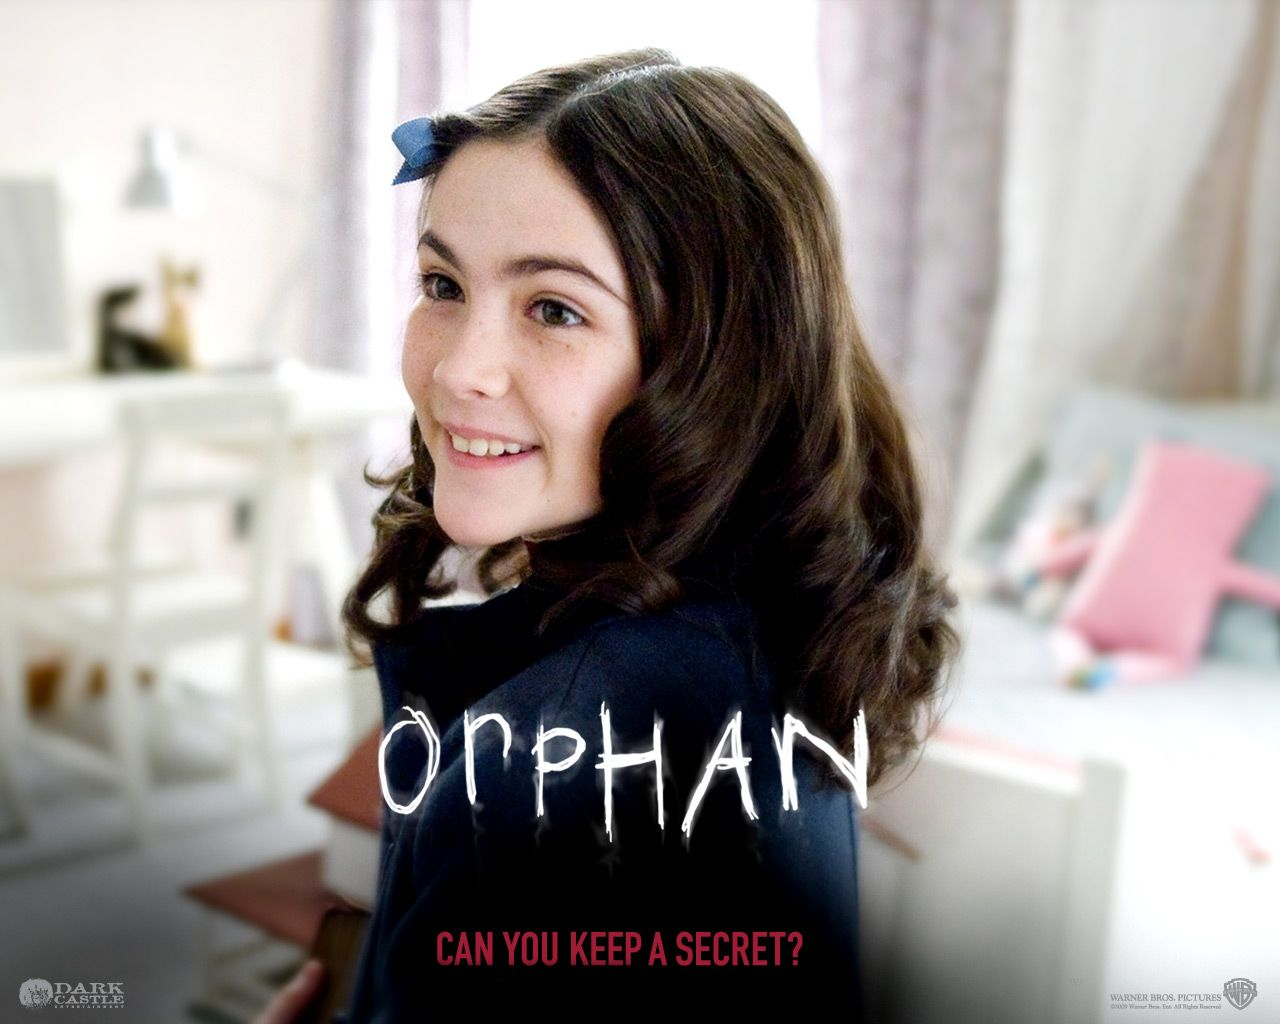 Orphan   Dont let her cuteness fool you Starring Vera Farmiga 1280x1024